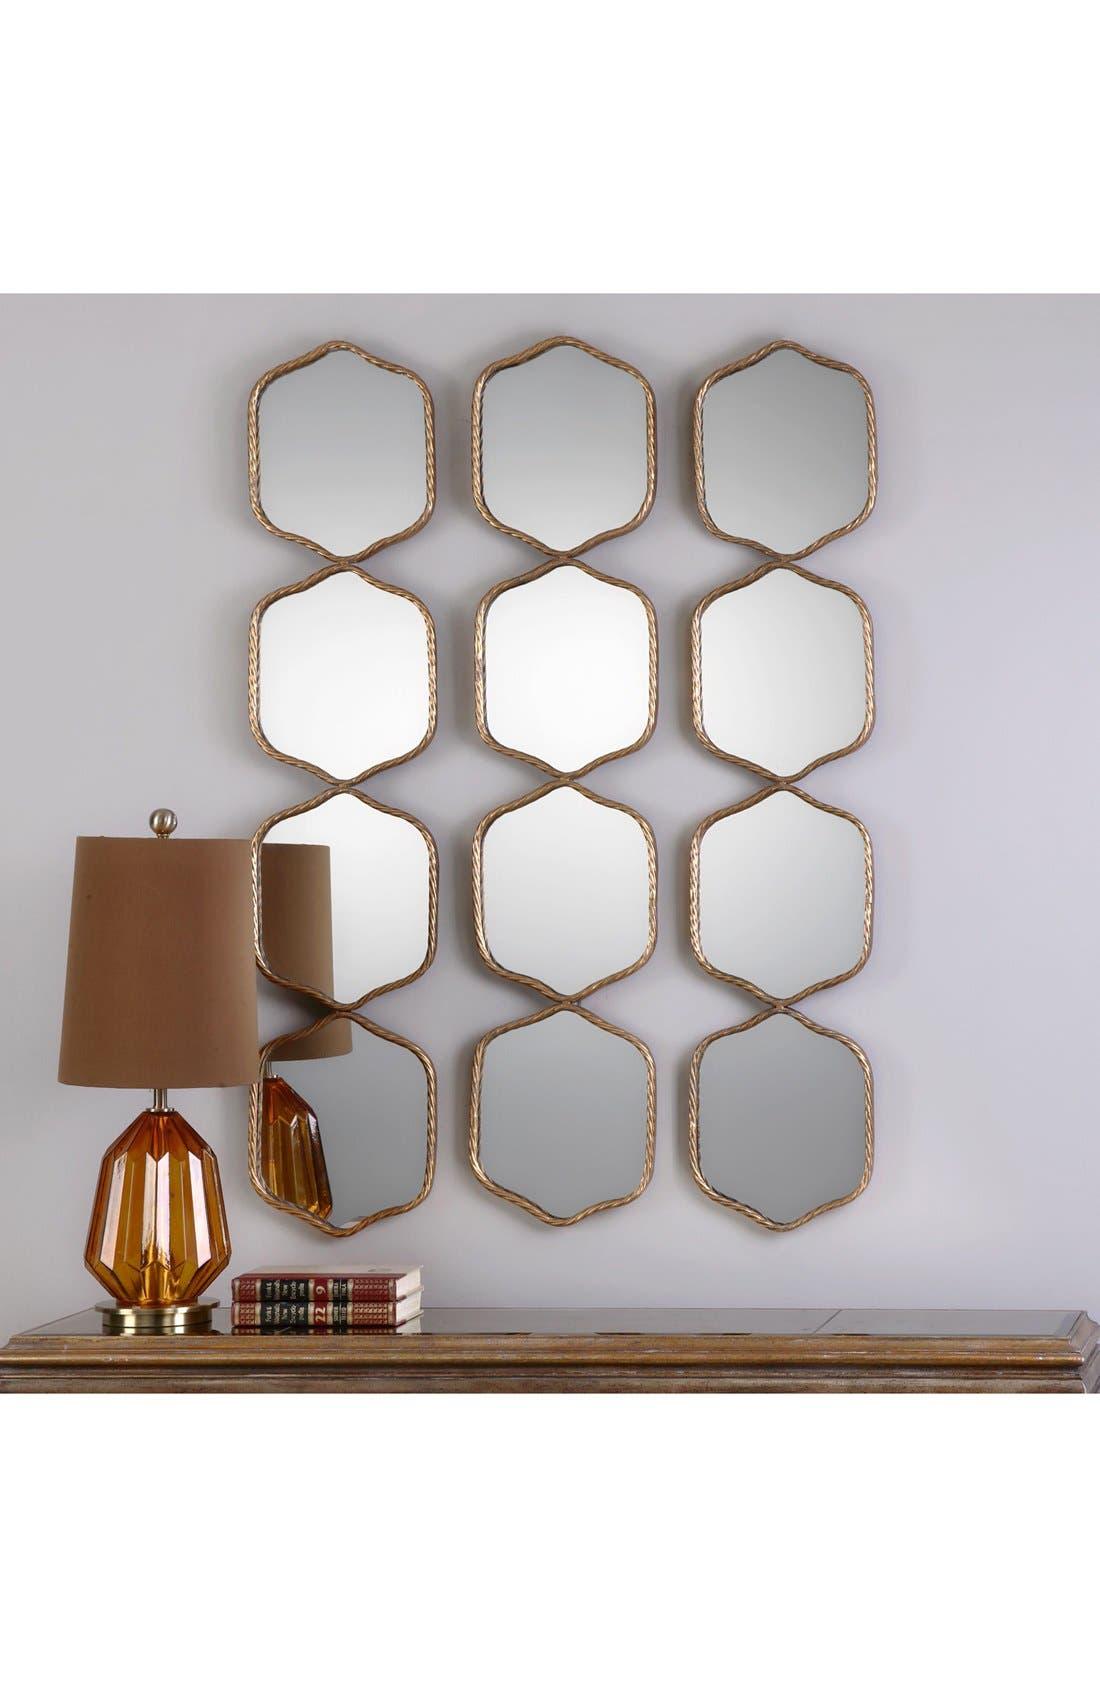 'Myriam' Wall Mirror,                             Alternate thumbnail 2, color,                             Metallic Gold